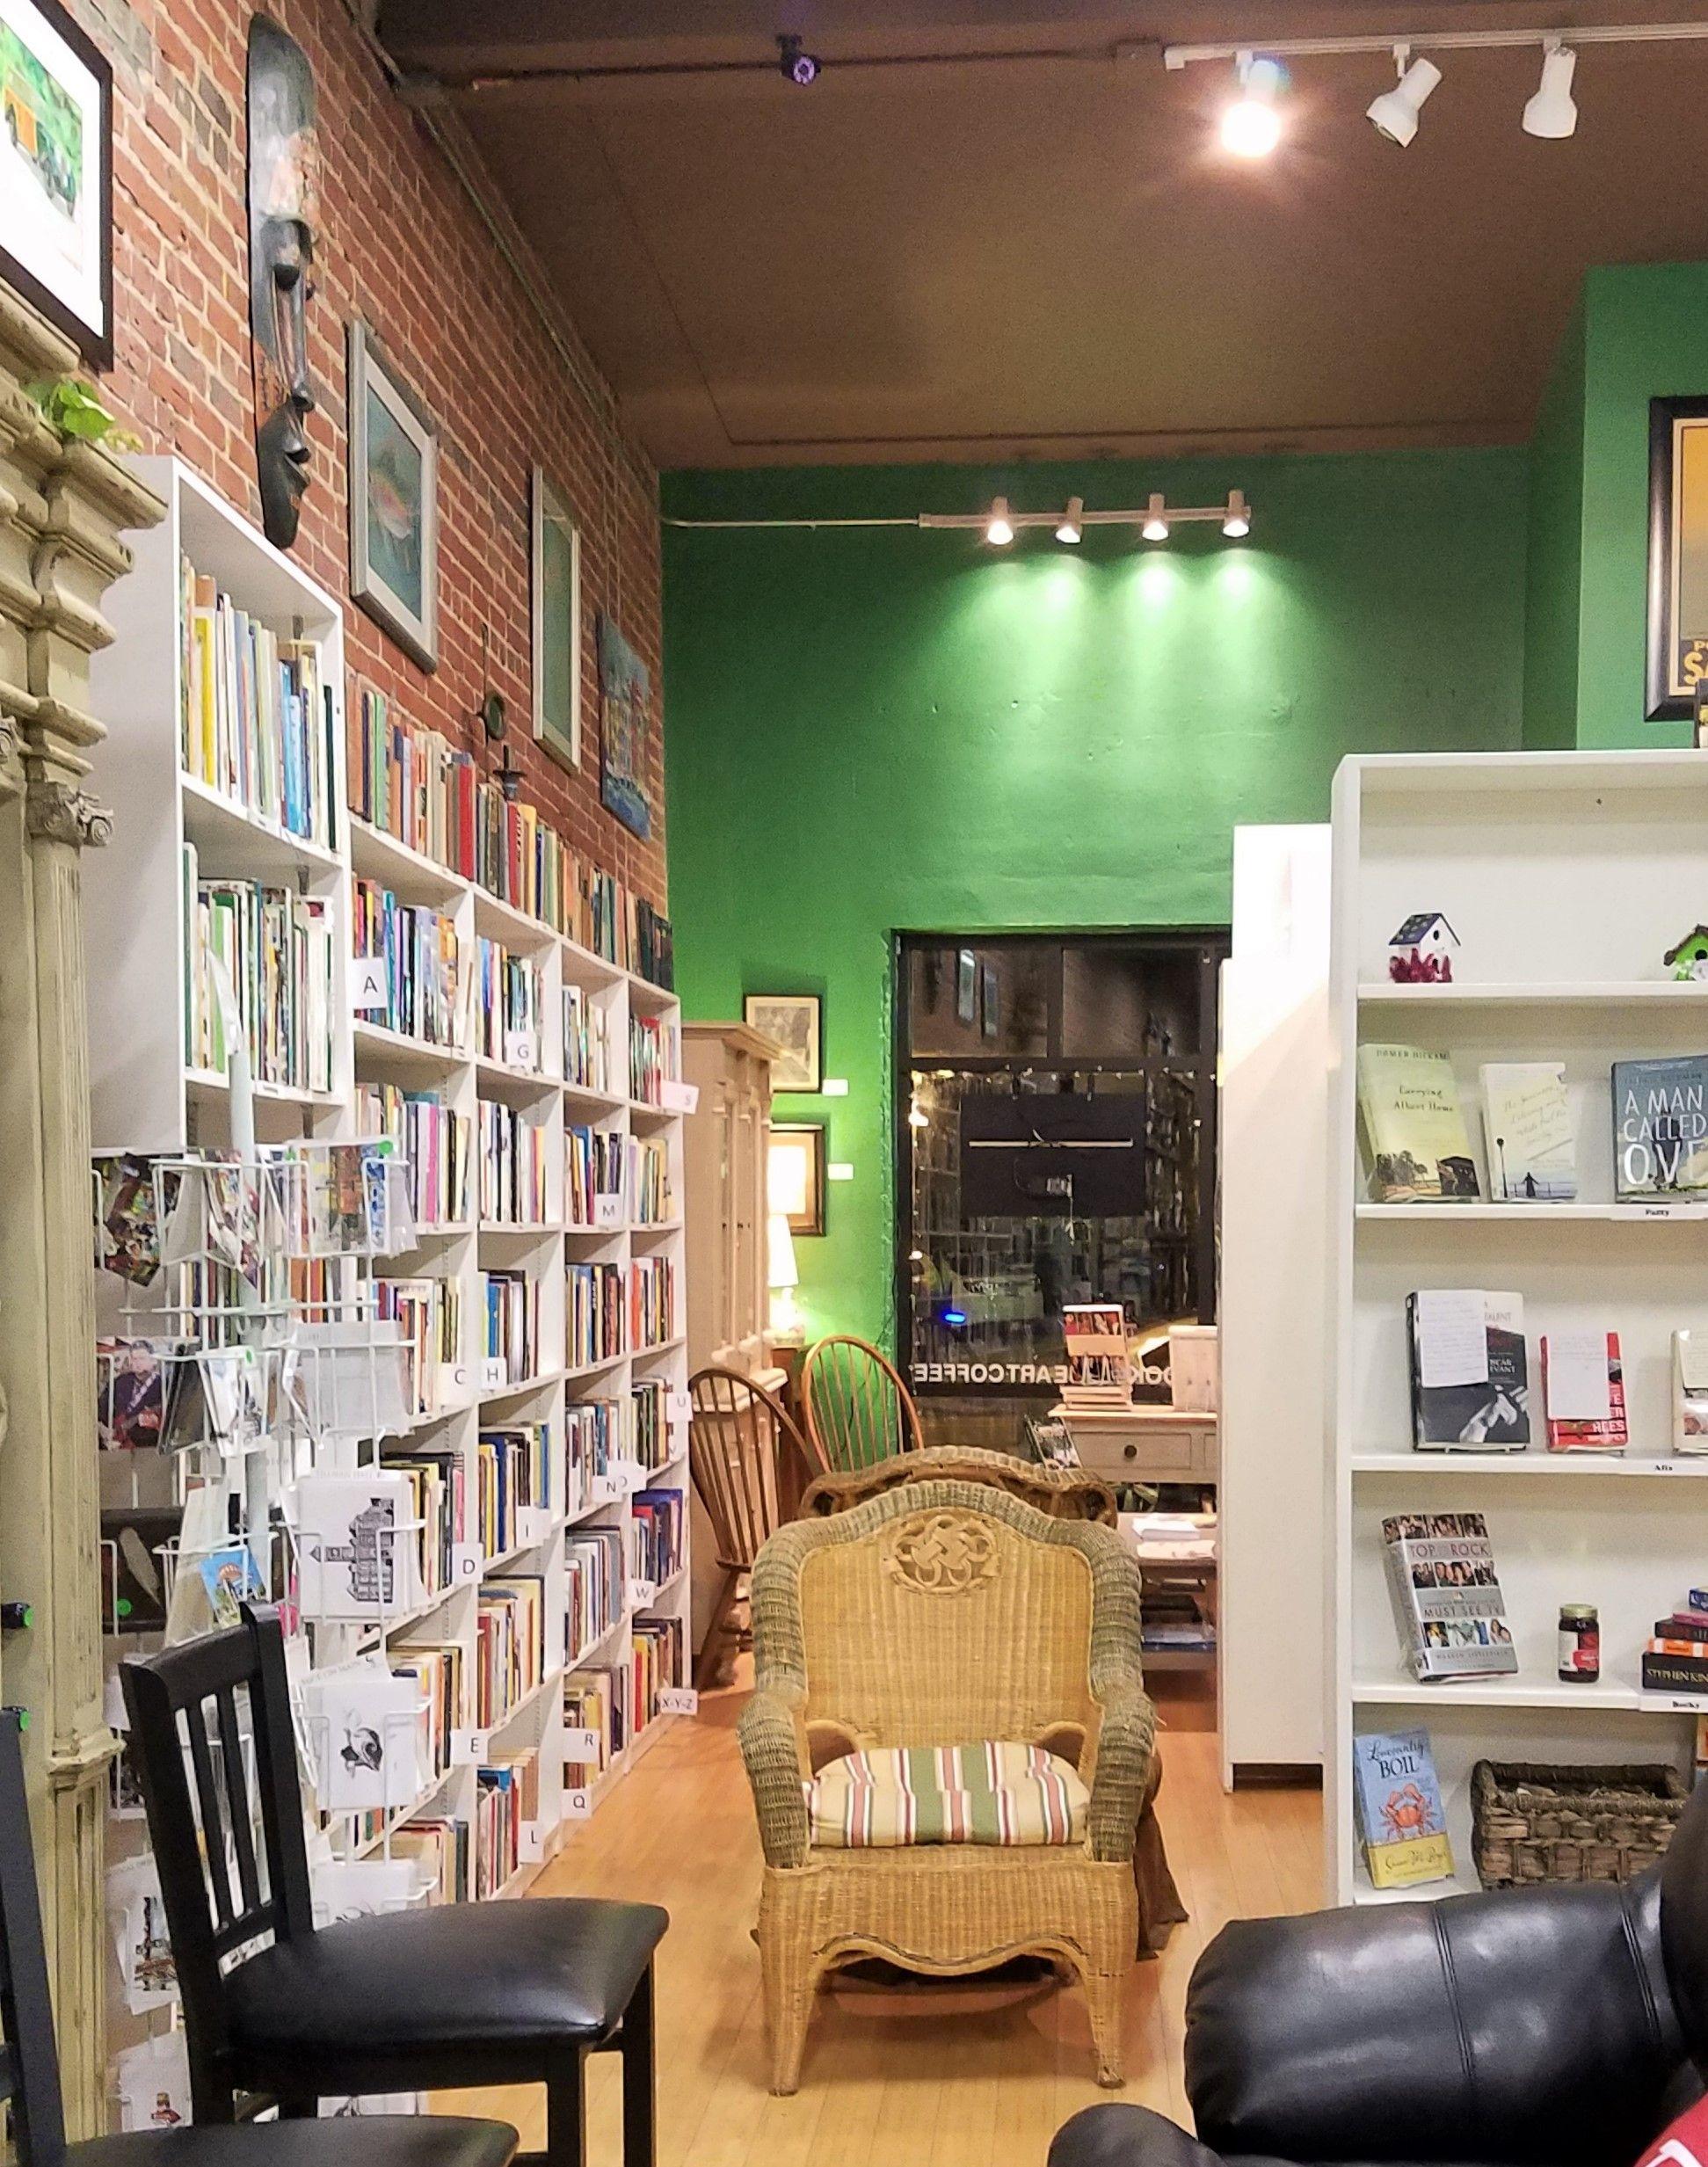 Joe S Place Downtown Greenville Sc Books Wine C Greenville Coffee Places Greenville Sc